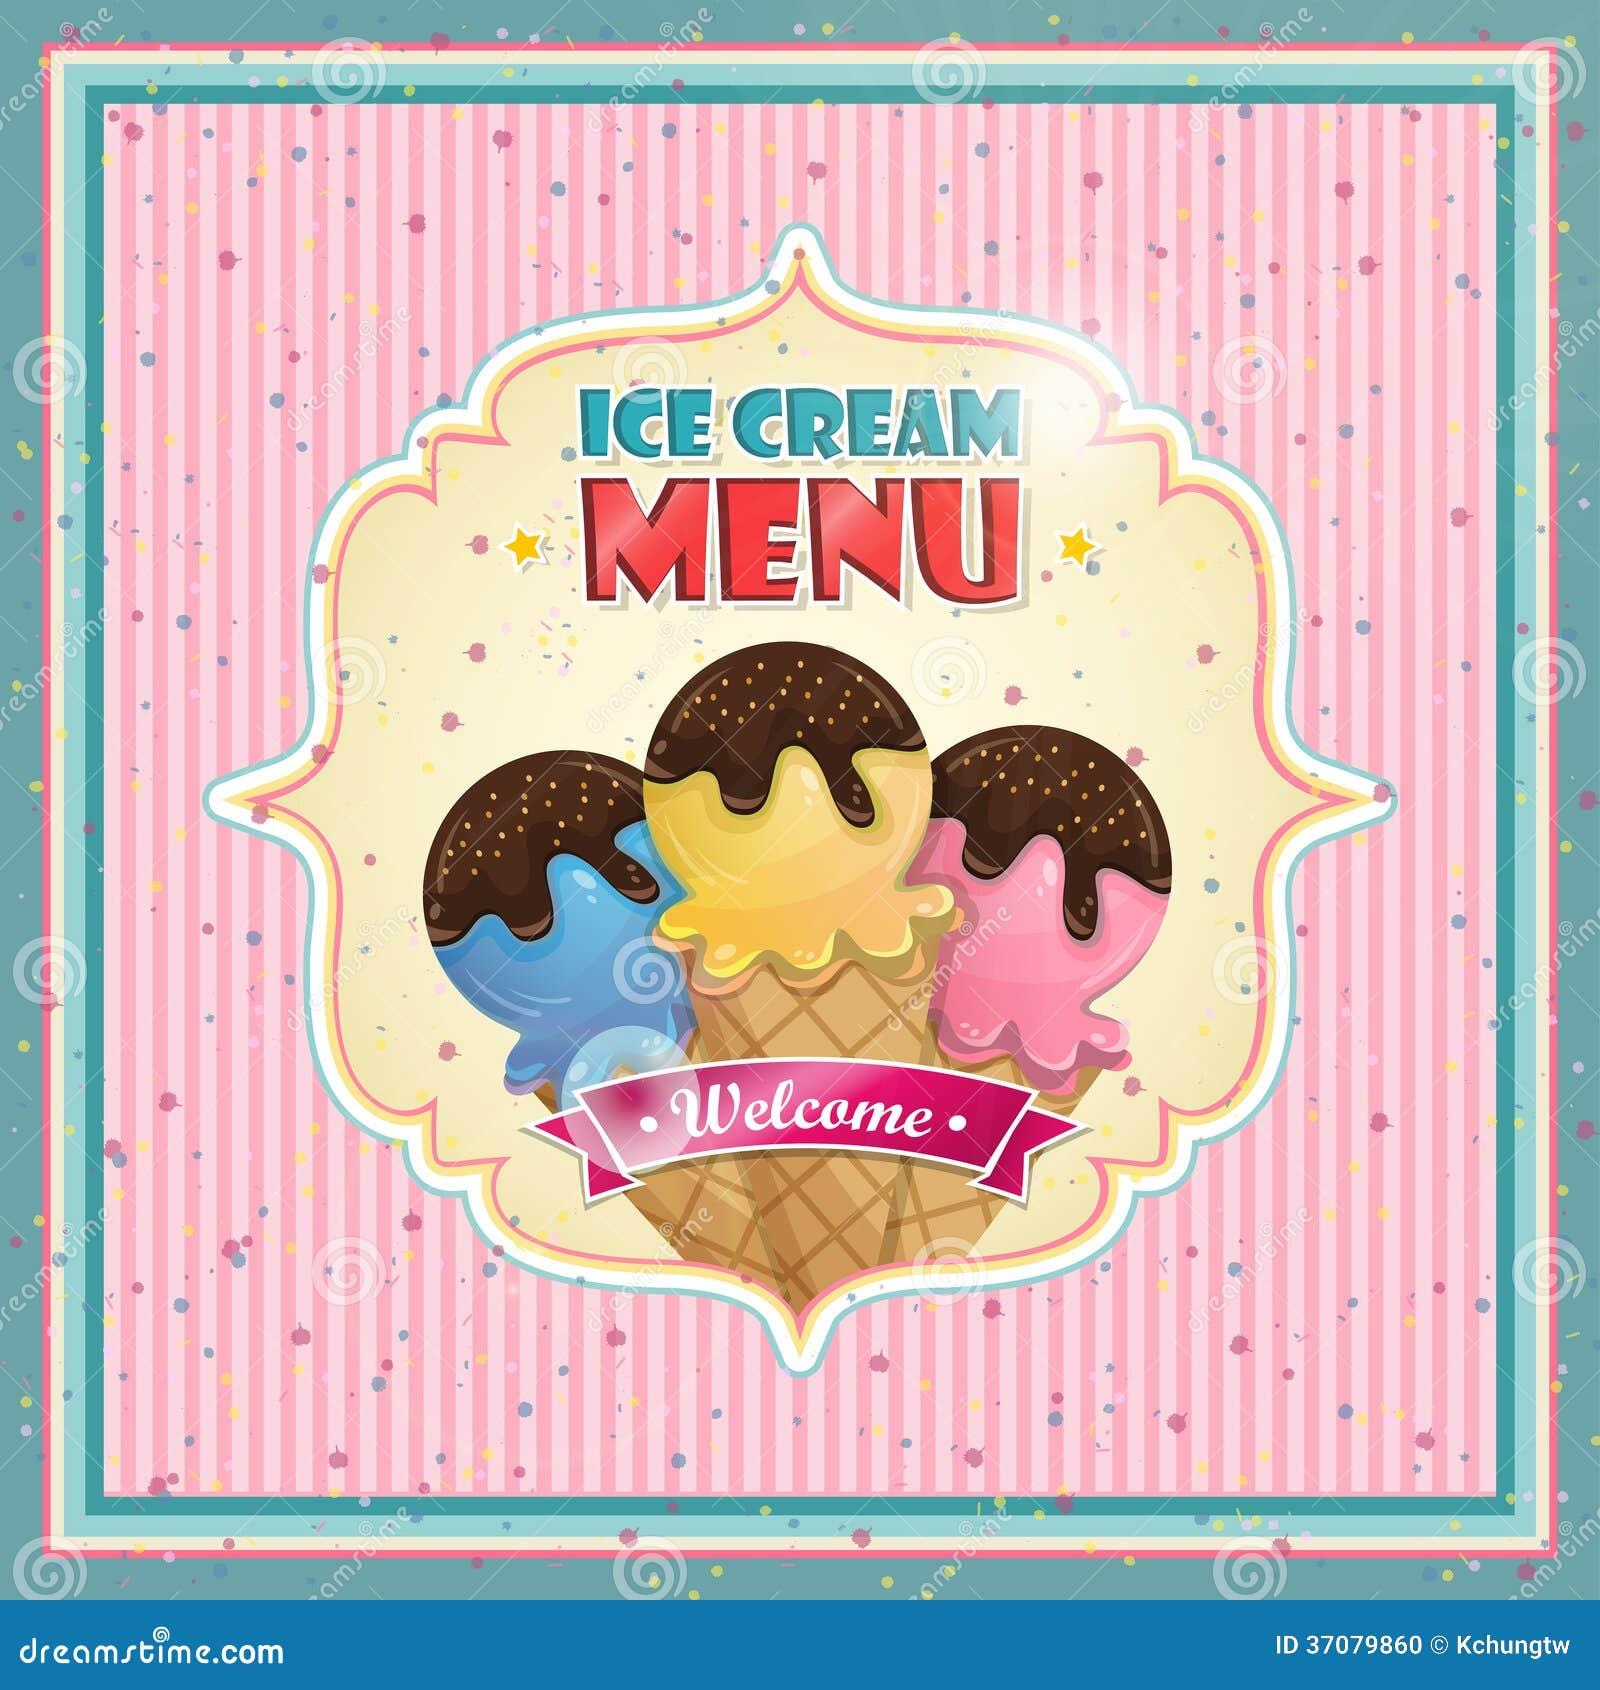 restaurant ice cream menu cover vector design template stock vector